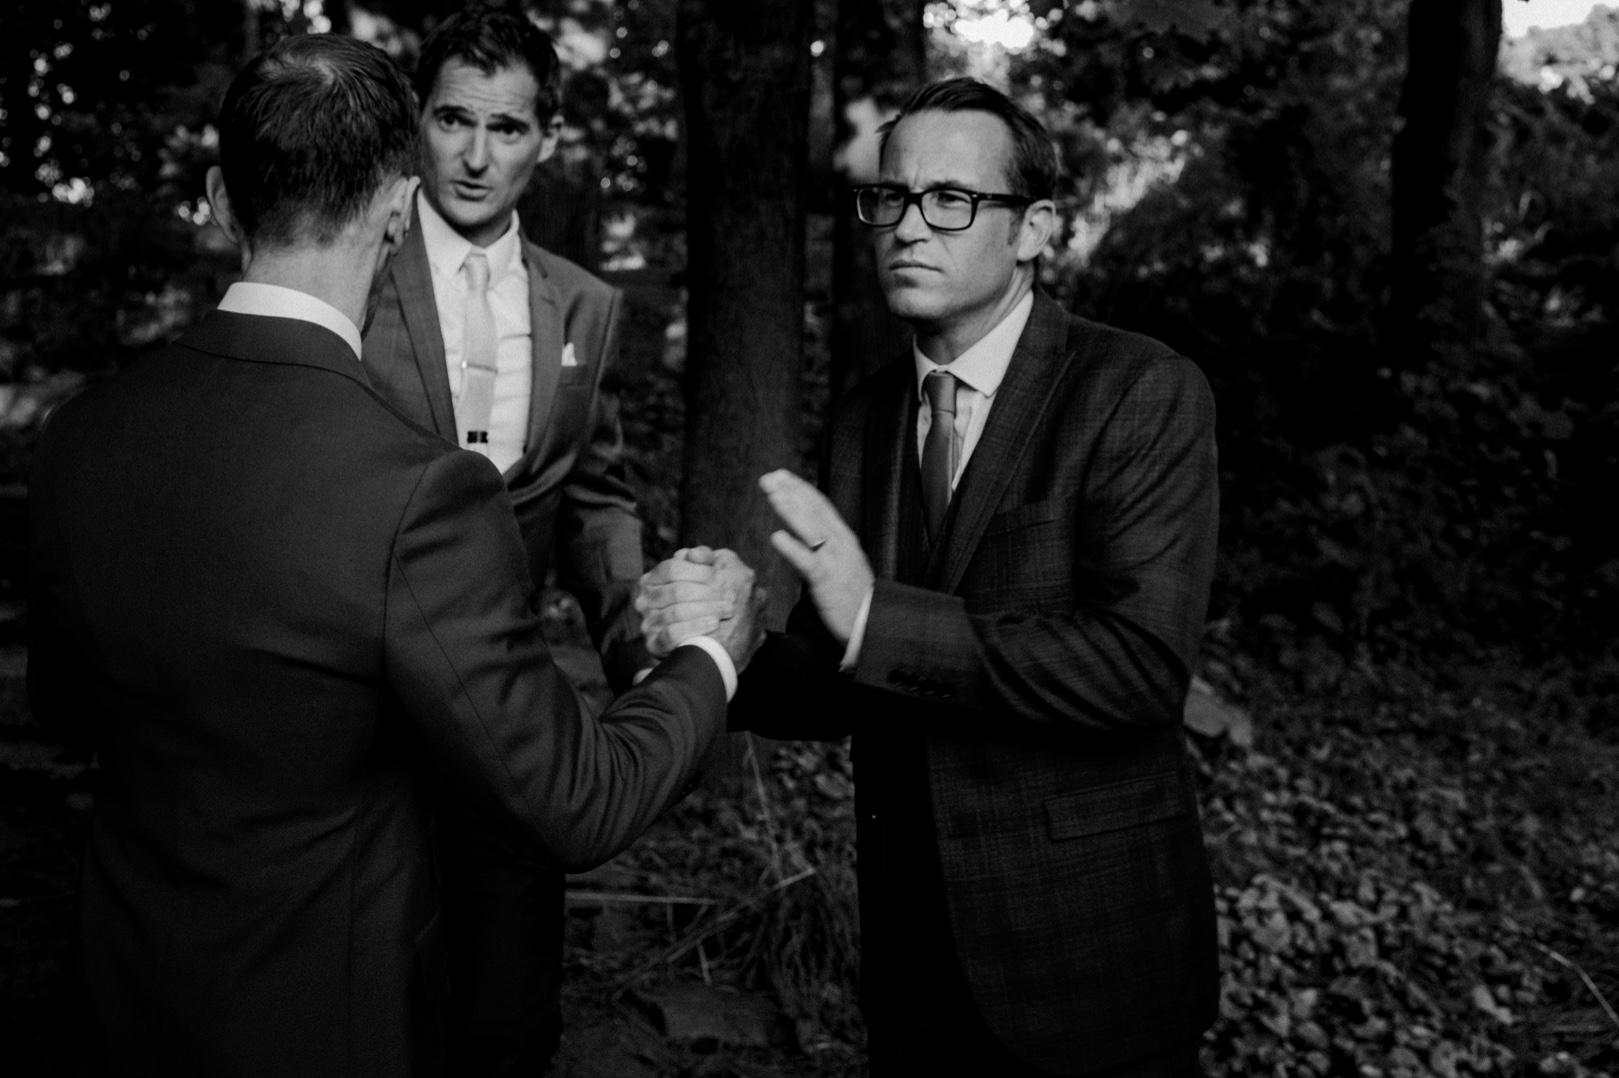 46_JACQUELINE RICH WEDDING AJ-271_Events_Weddings_2018_Travel_Engagement_Photography_best_Portraits.jpg